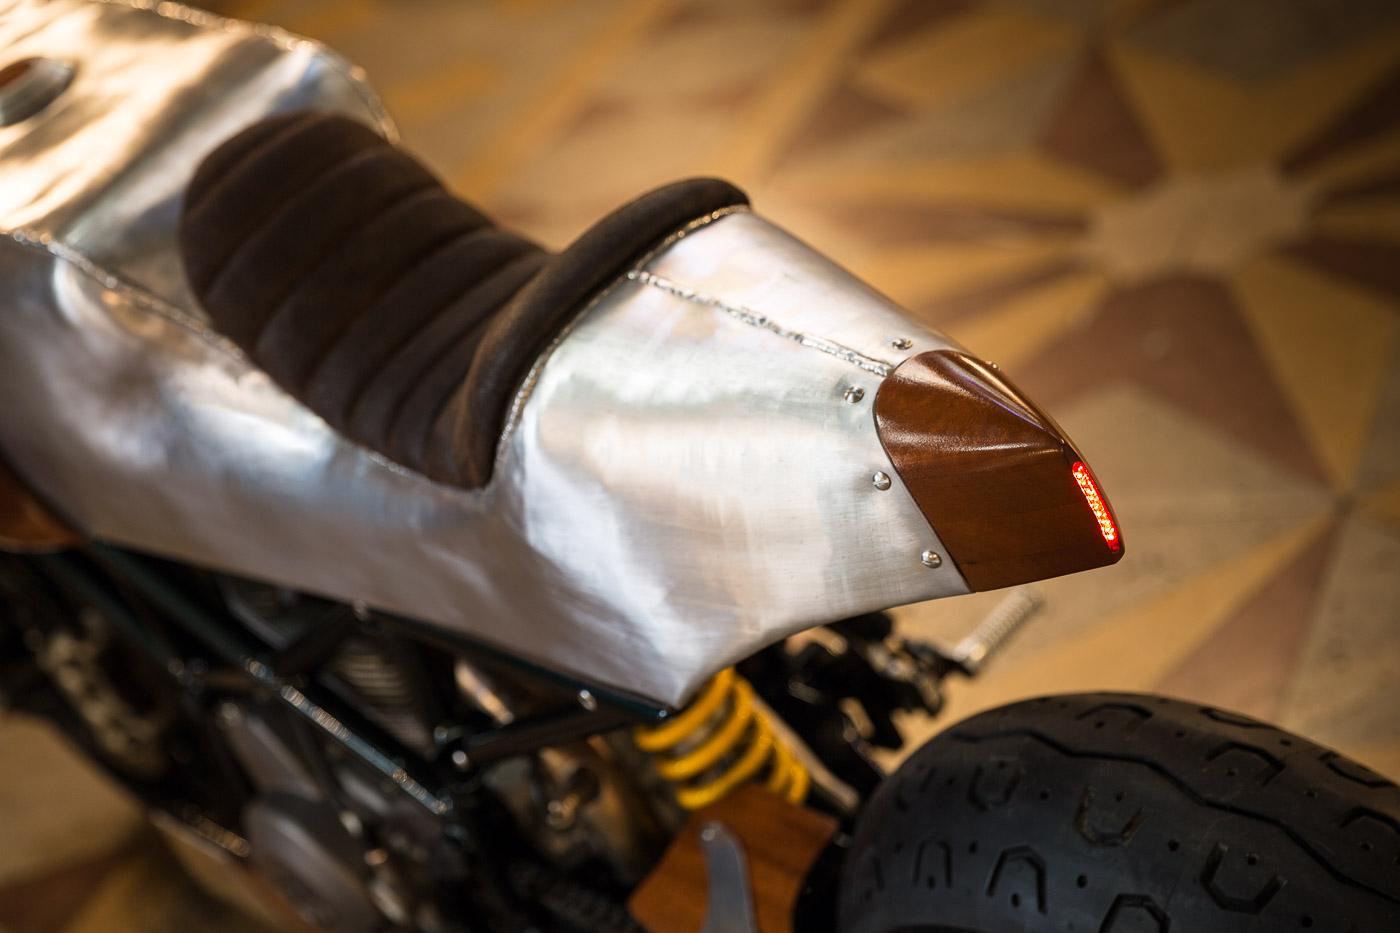 BU_Tresor_Bike (12 von 24)